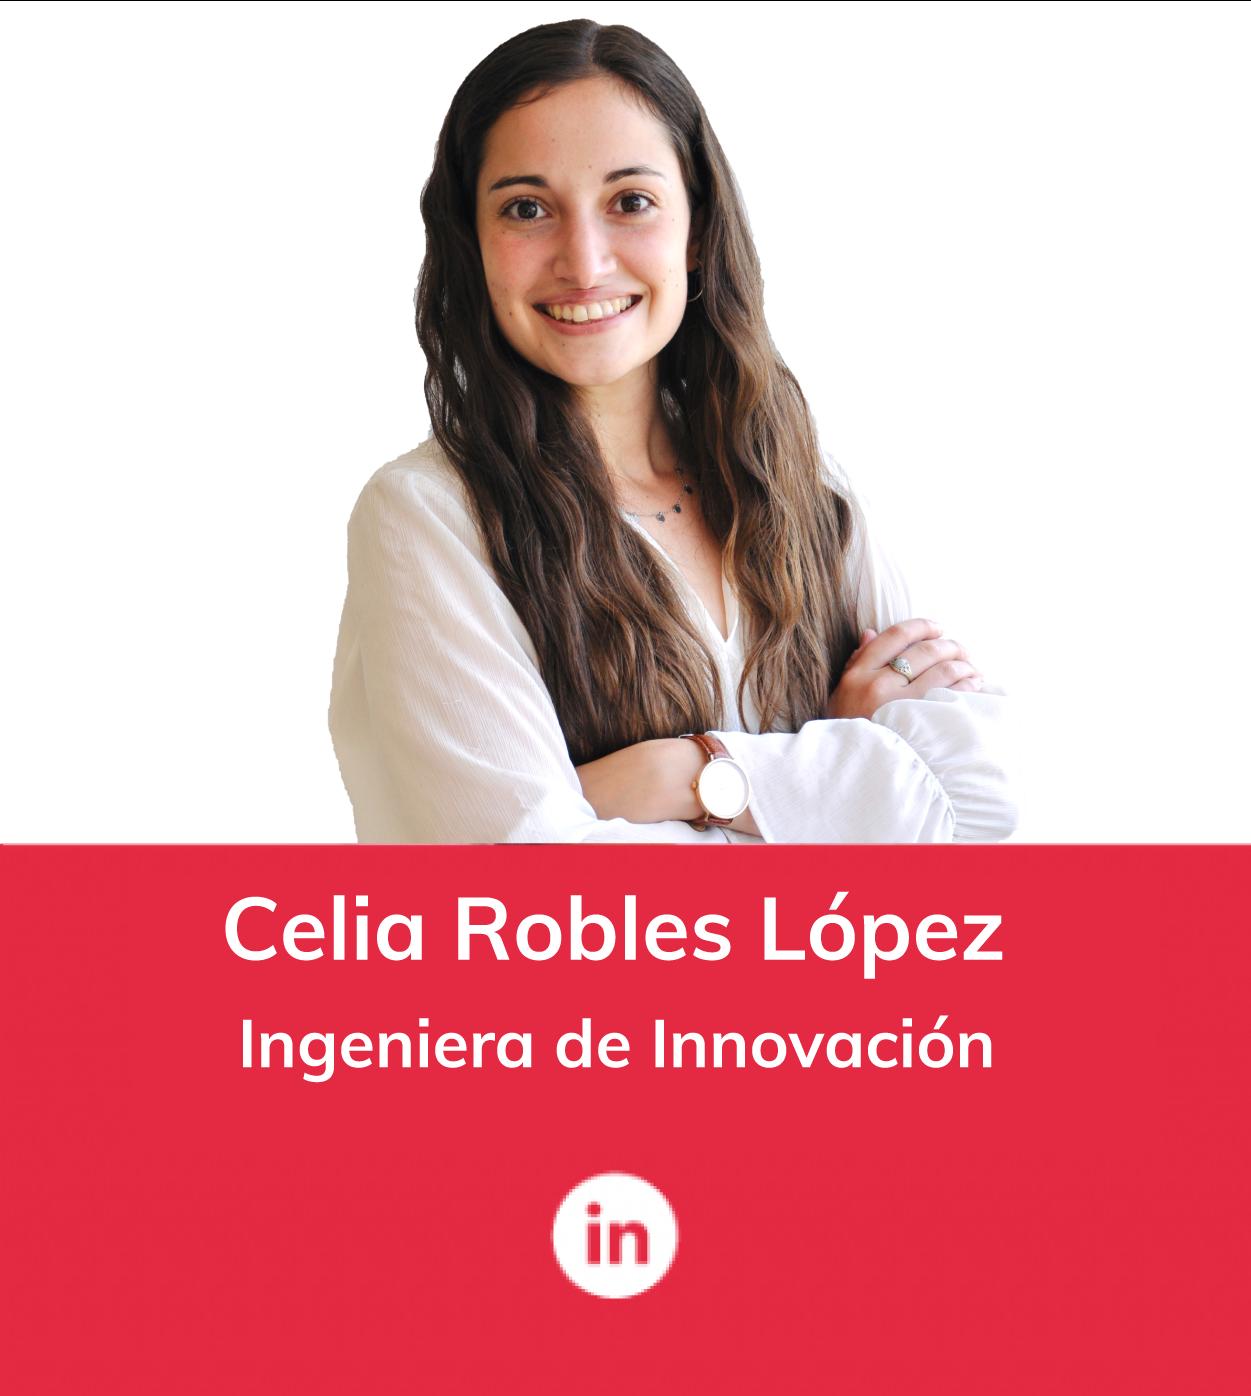 Celia Robles